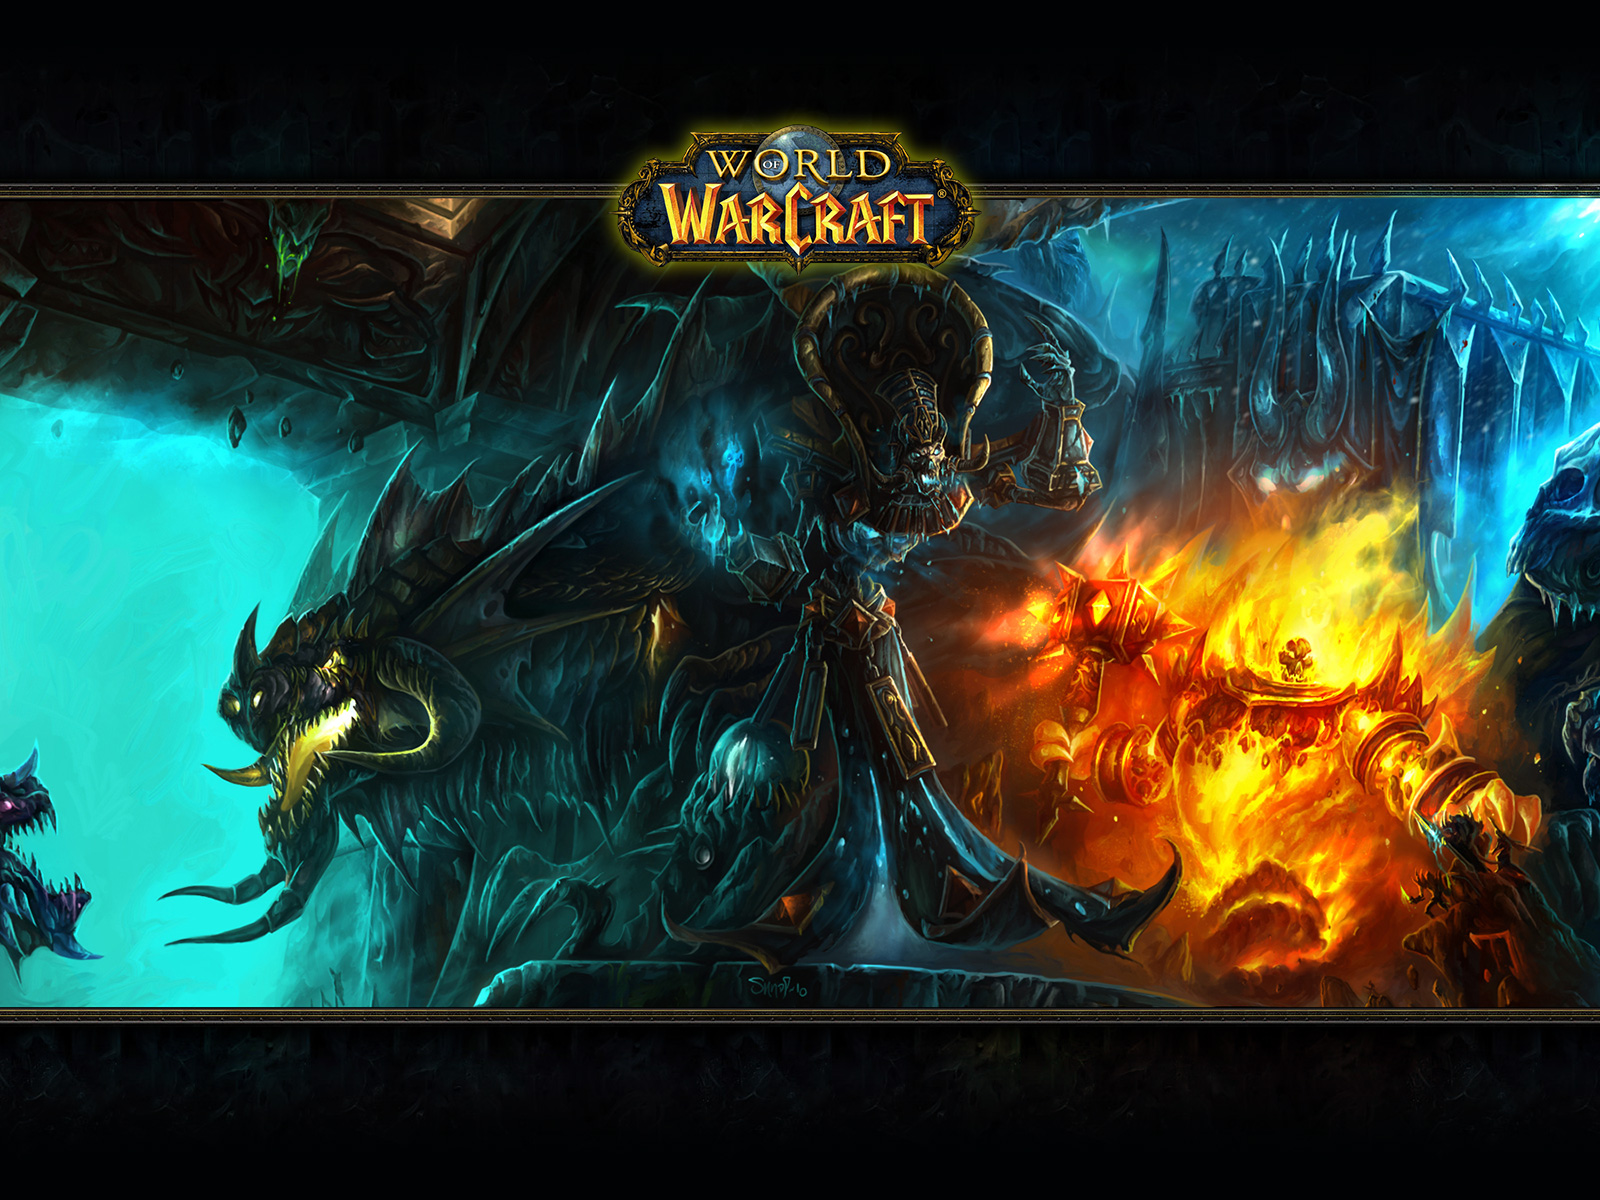 Warcraft 3 desktop wallpaper Warcraft 3 wallpapers 1600x1200